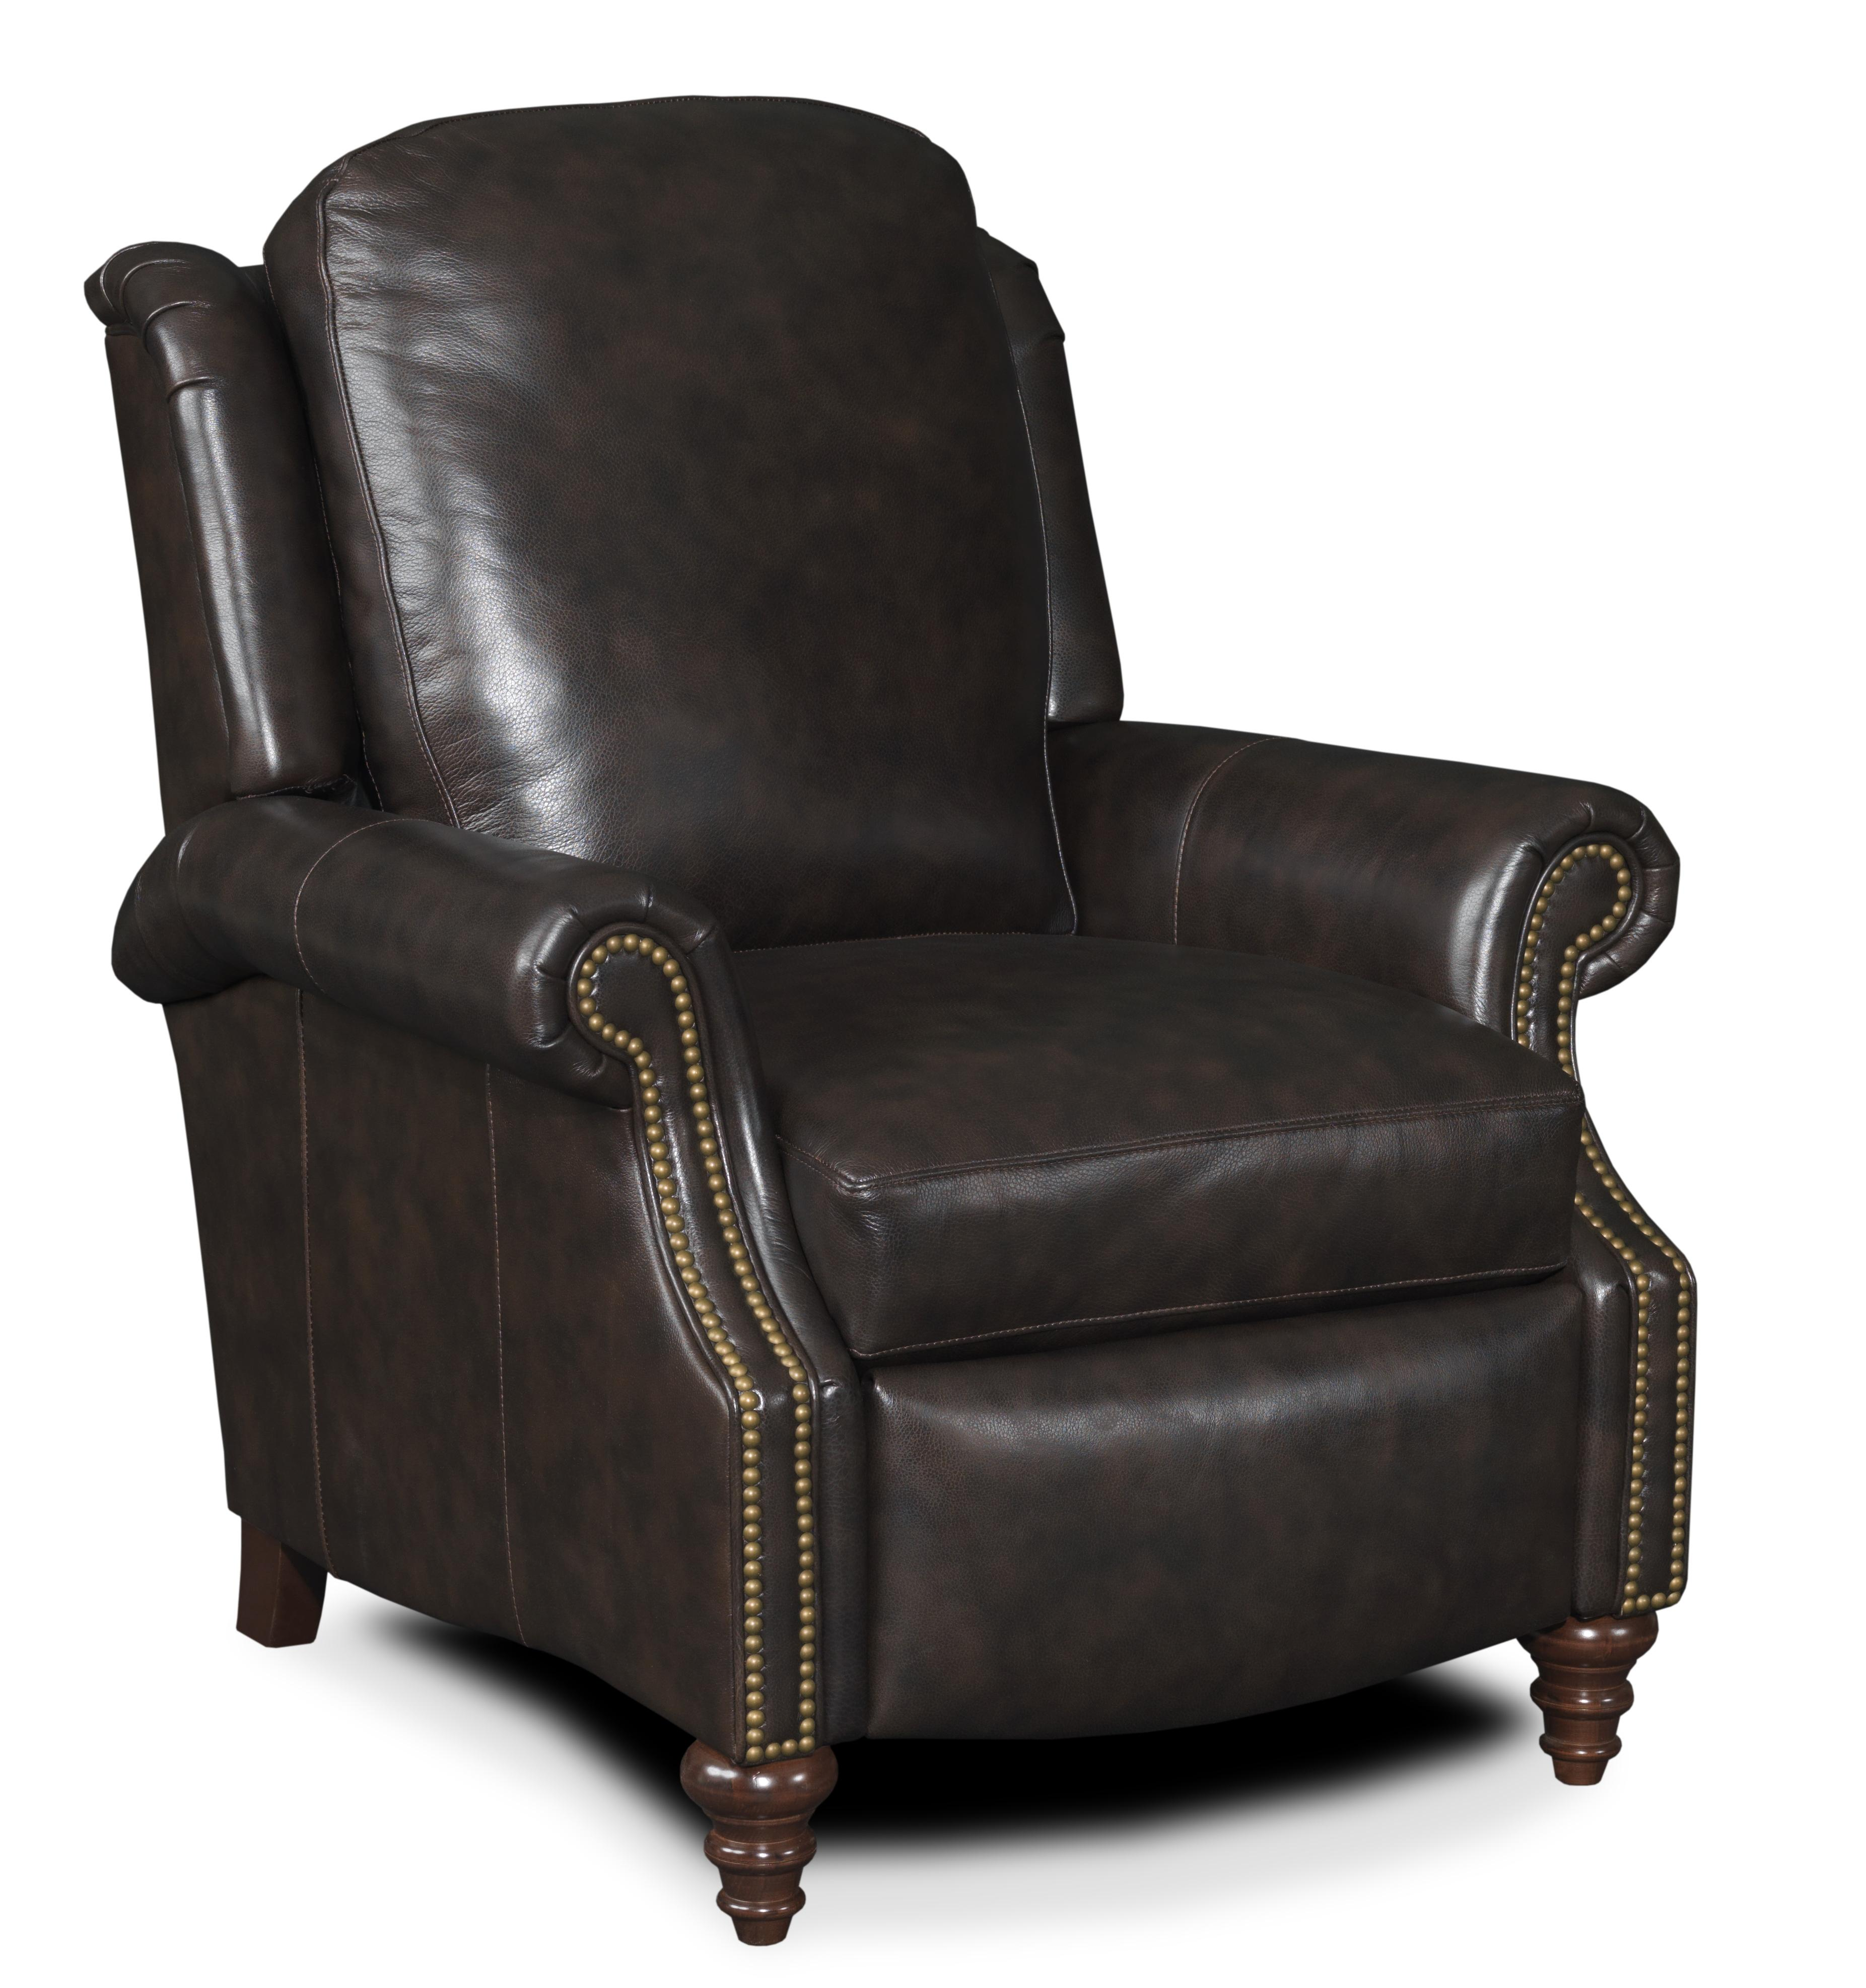 Bradington Young Chairs That Recline Hobson Pushback Recliner Belfort Furniture High Leg